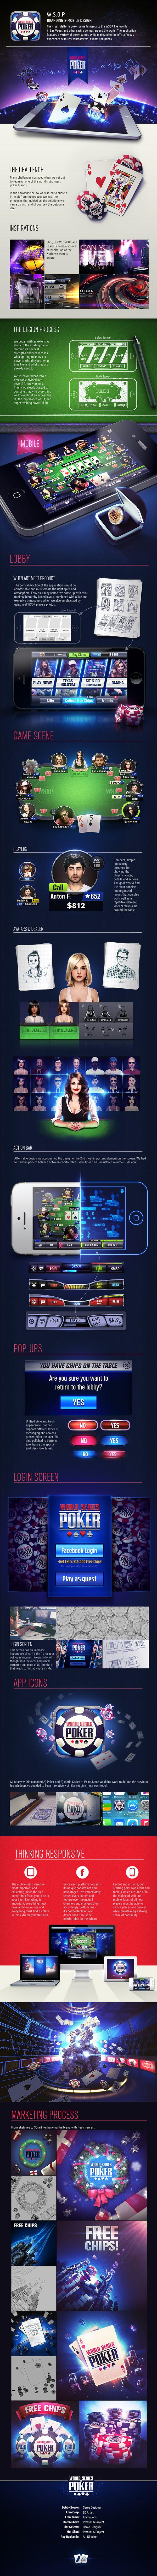 WSOP - The poker face-lift on Behance